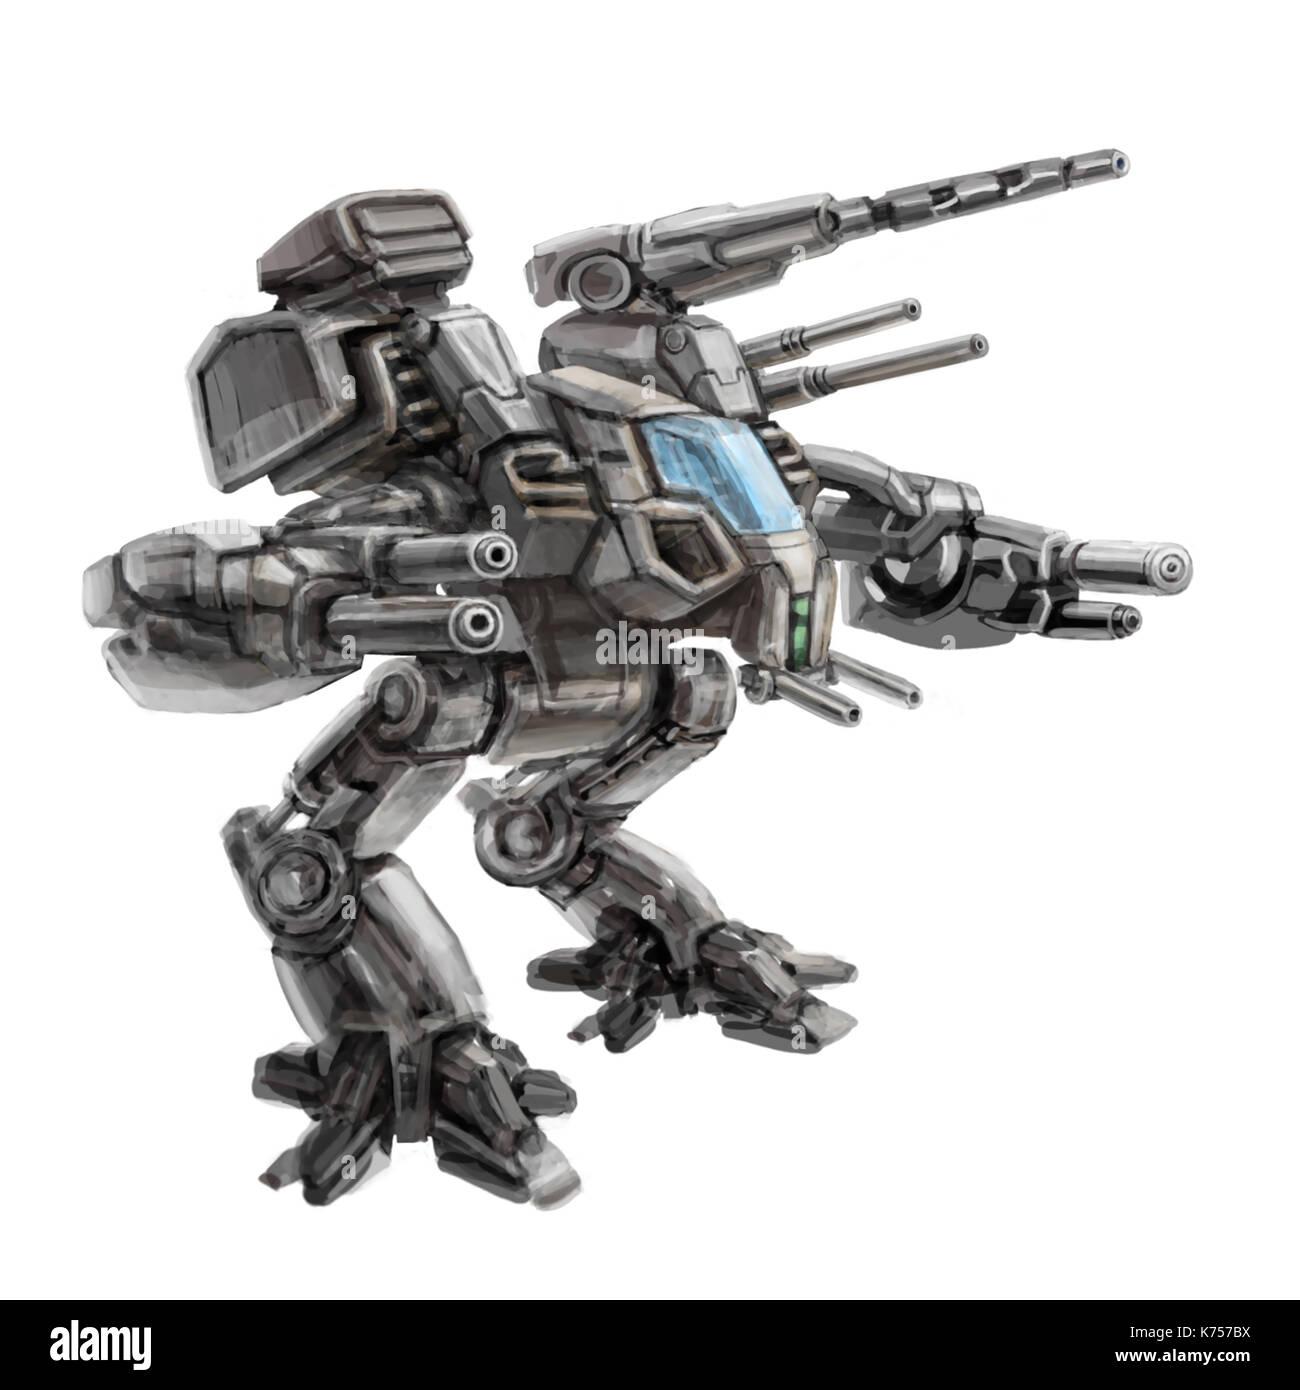 Two-legged walking combat robot. Science fiction illustration. Original sci-fi military vehicle concept. - Stock Image